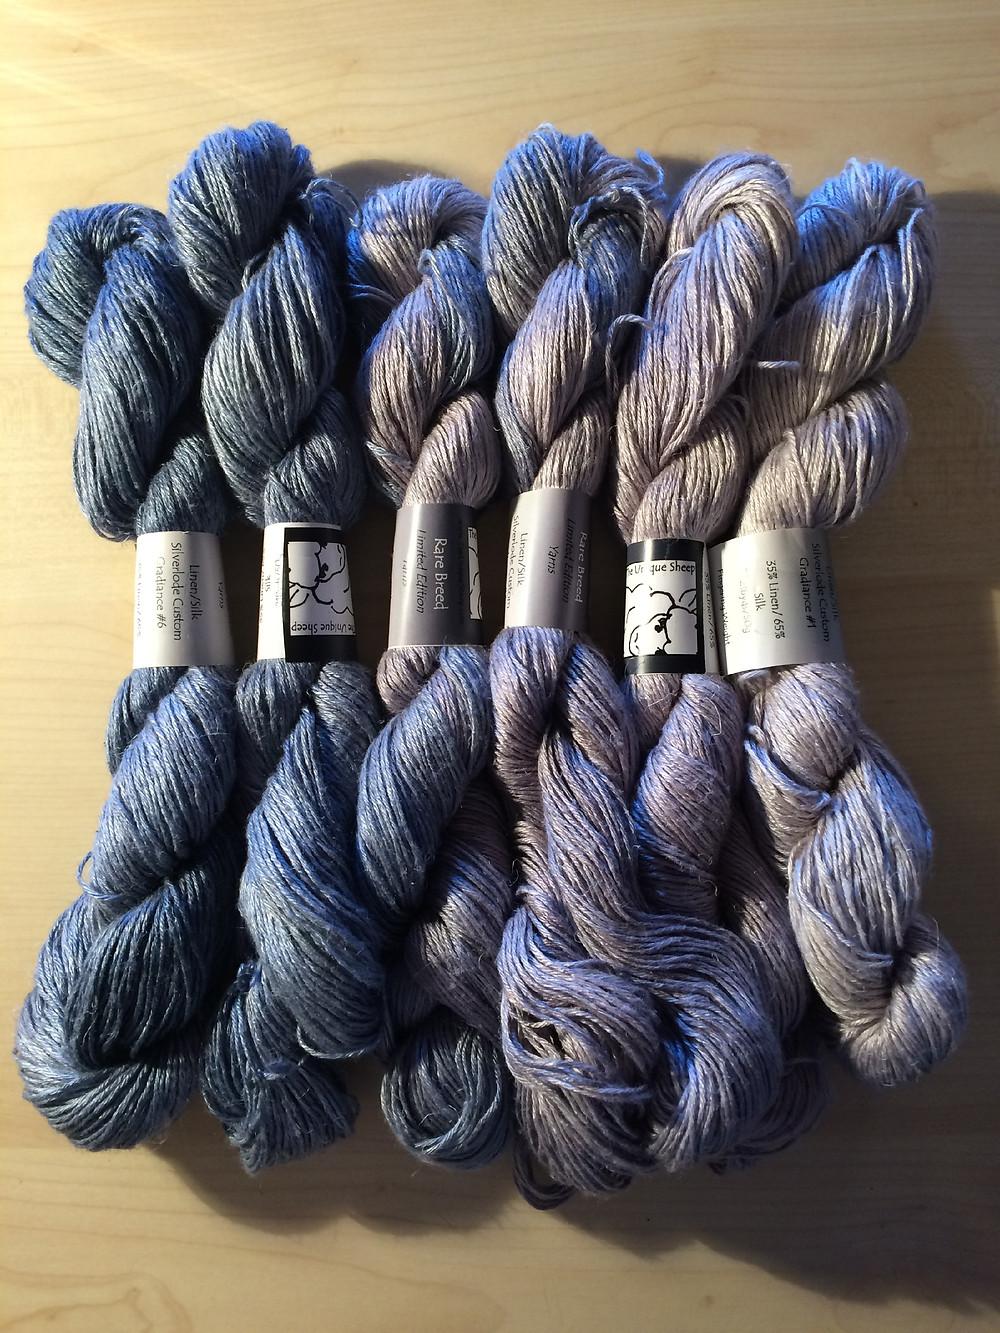 The Unique Sheep's Silverlode on Silk-Linen Rare Breed